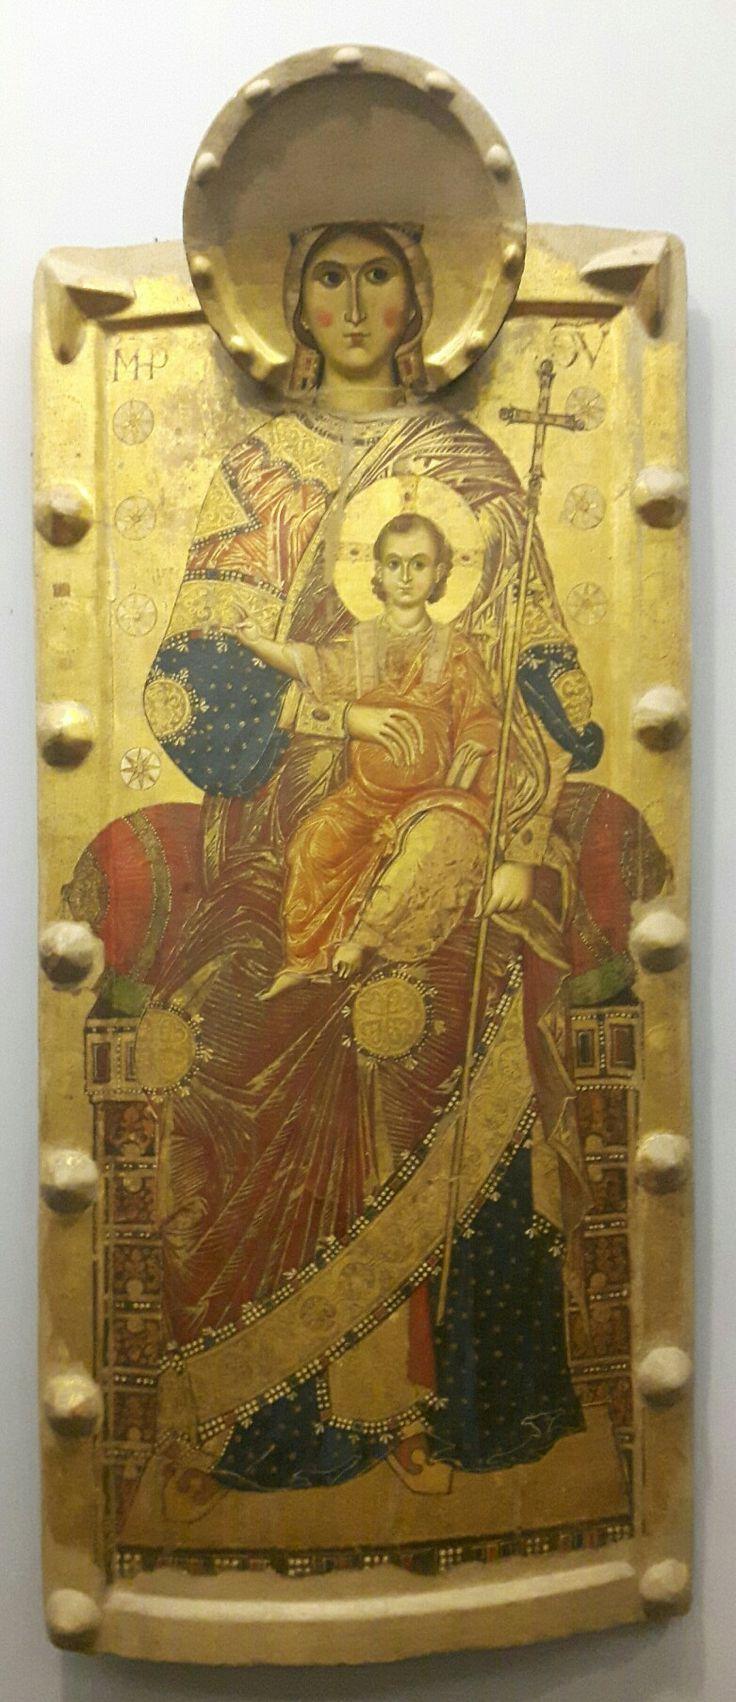 Madonna de Flumine. Fine Duecento. Produzione Amalfitana.  Capodimonte